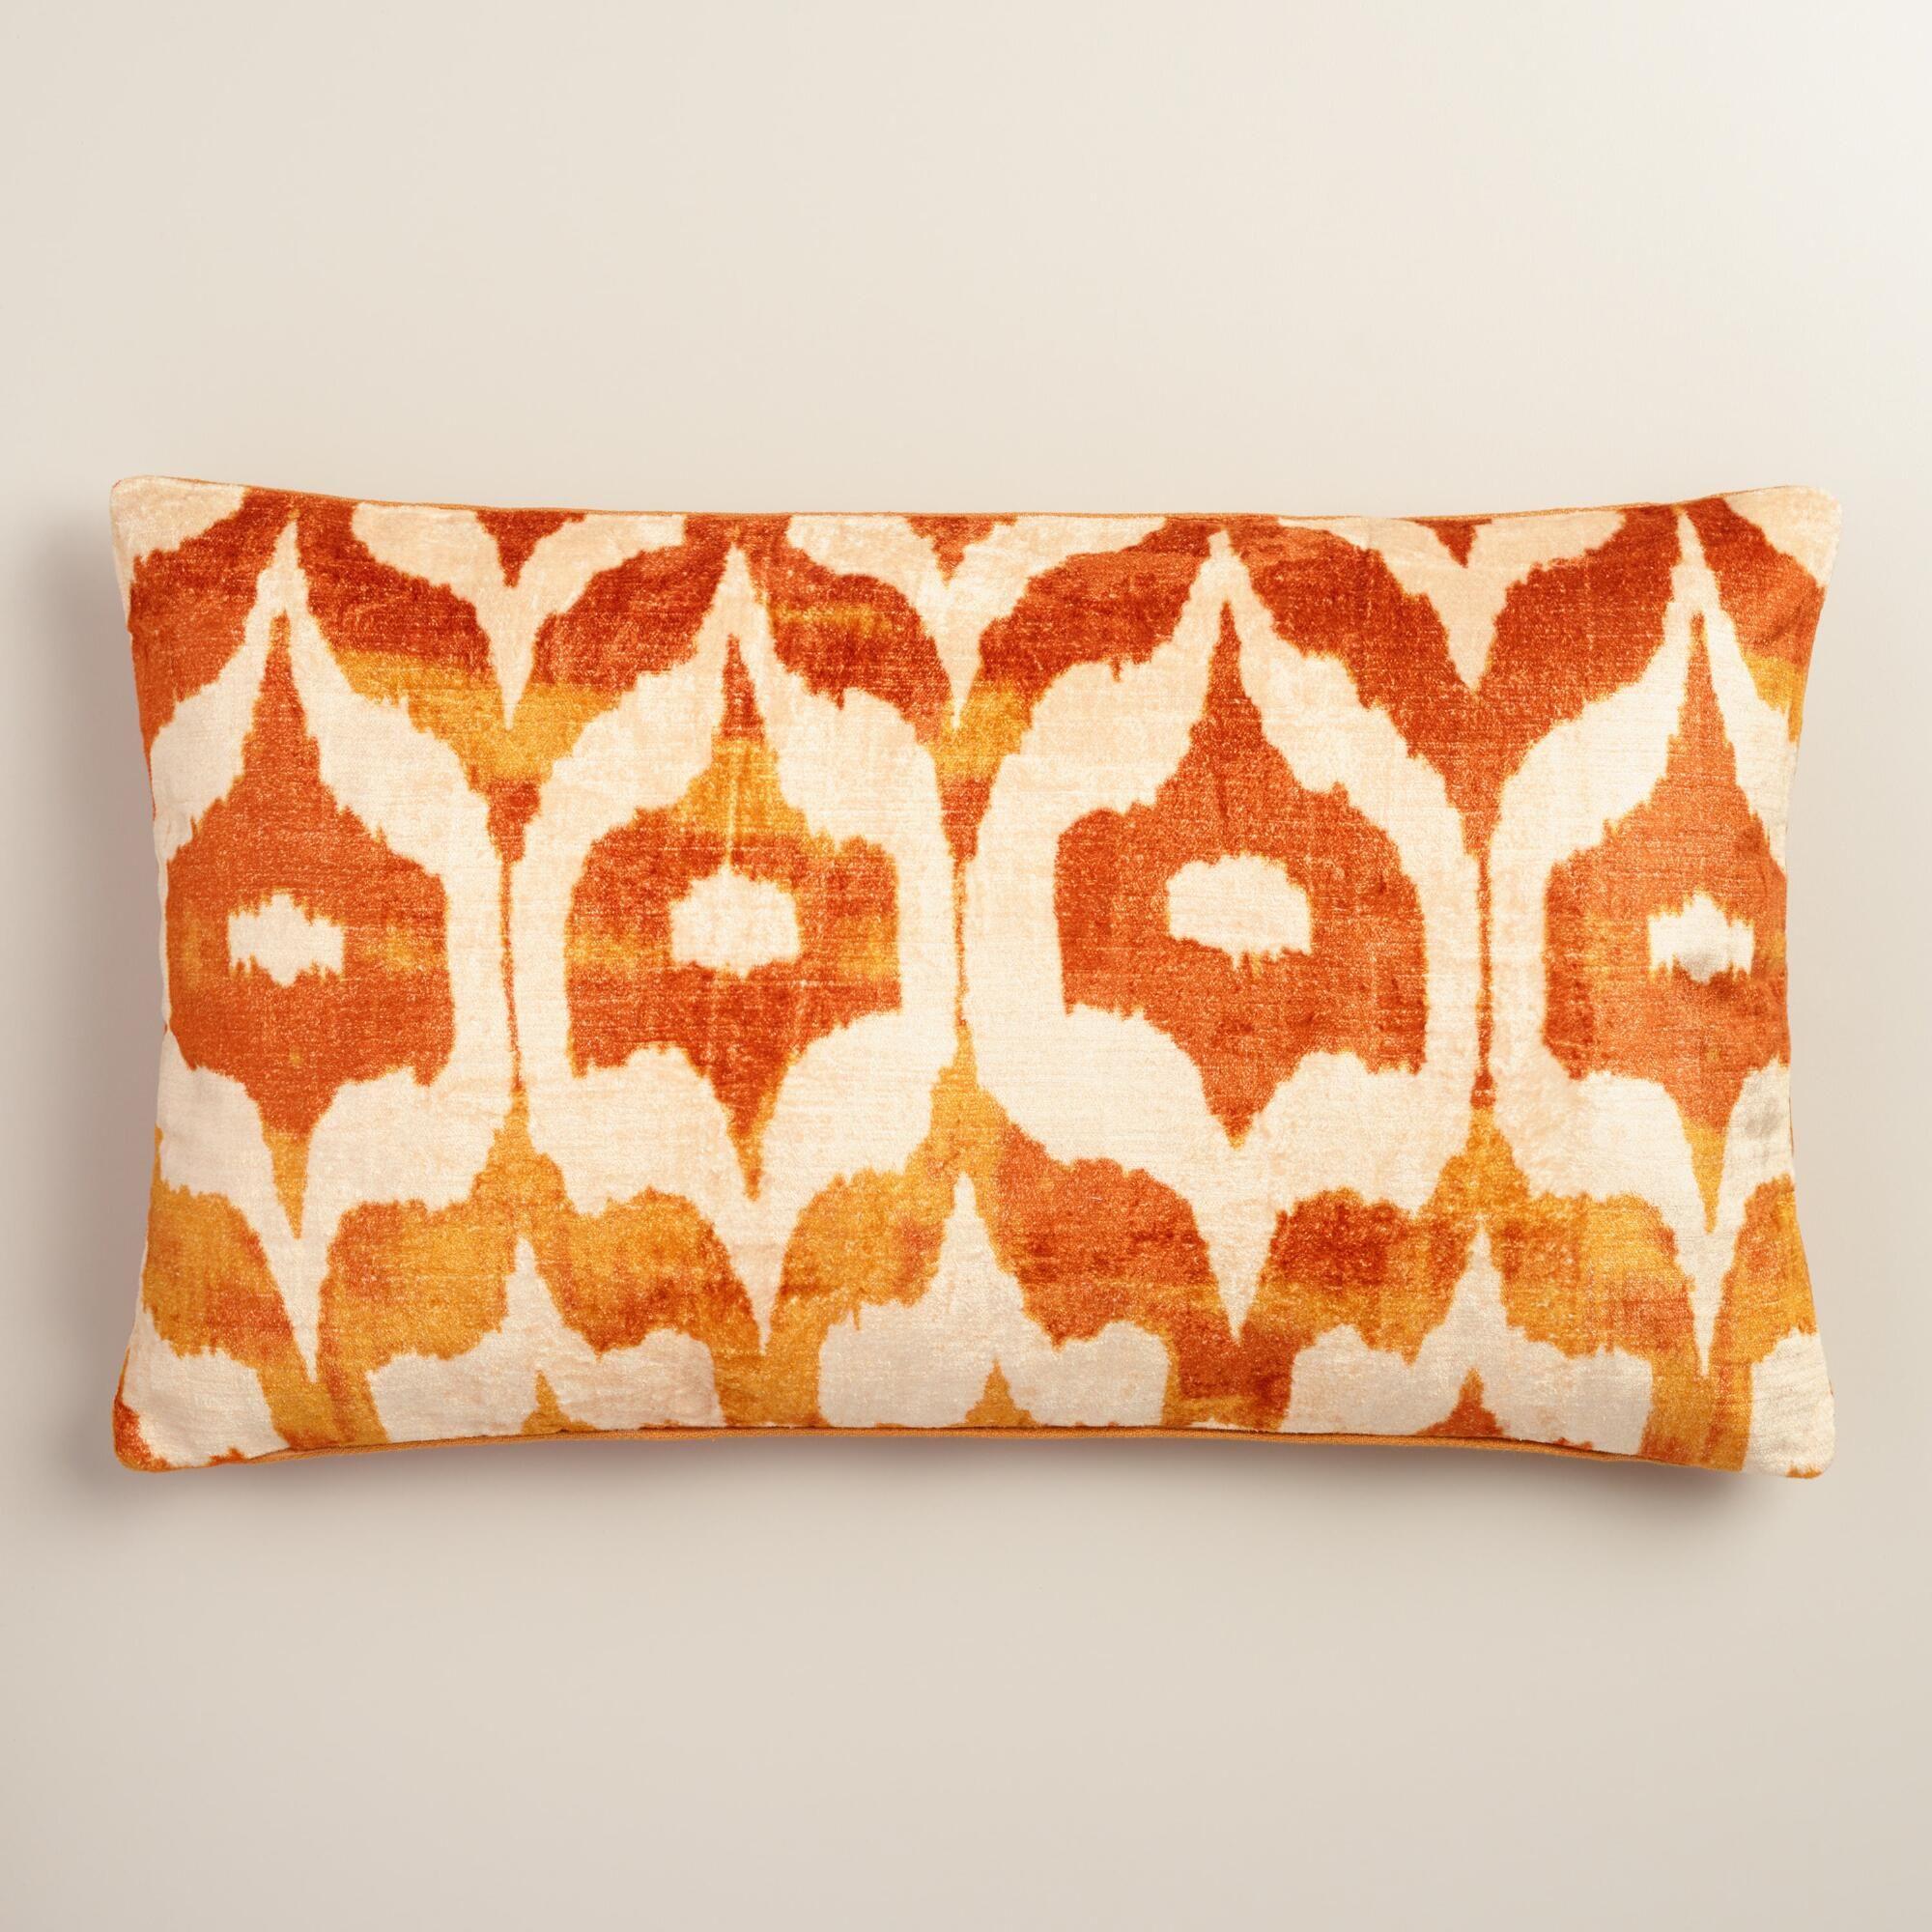 decorative waves lumbar on il art zoom throw pillows orange sea fullxfull pillow silk listing brown